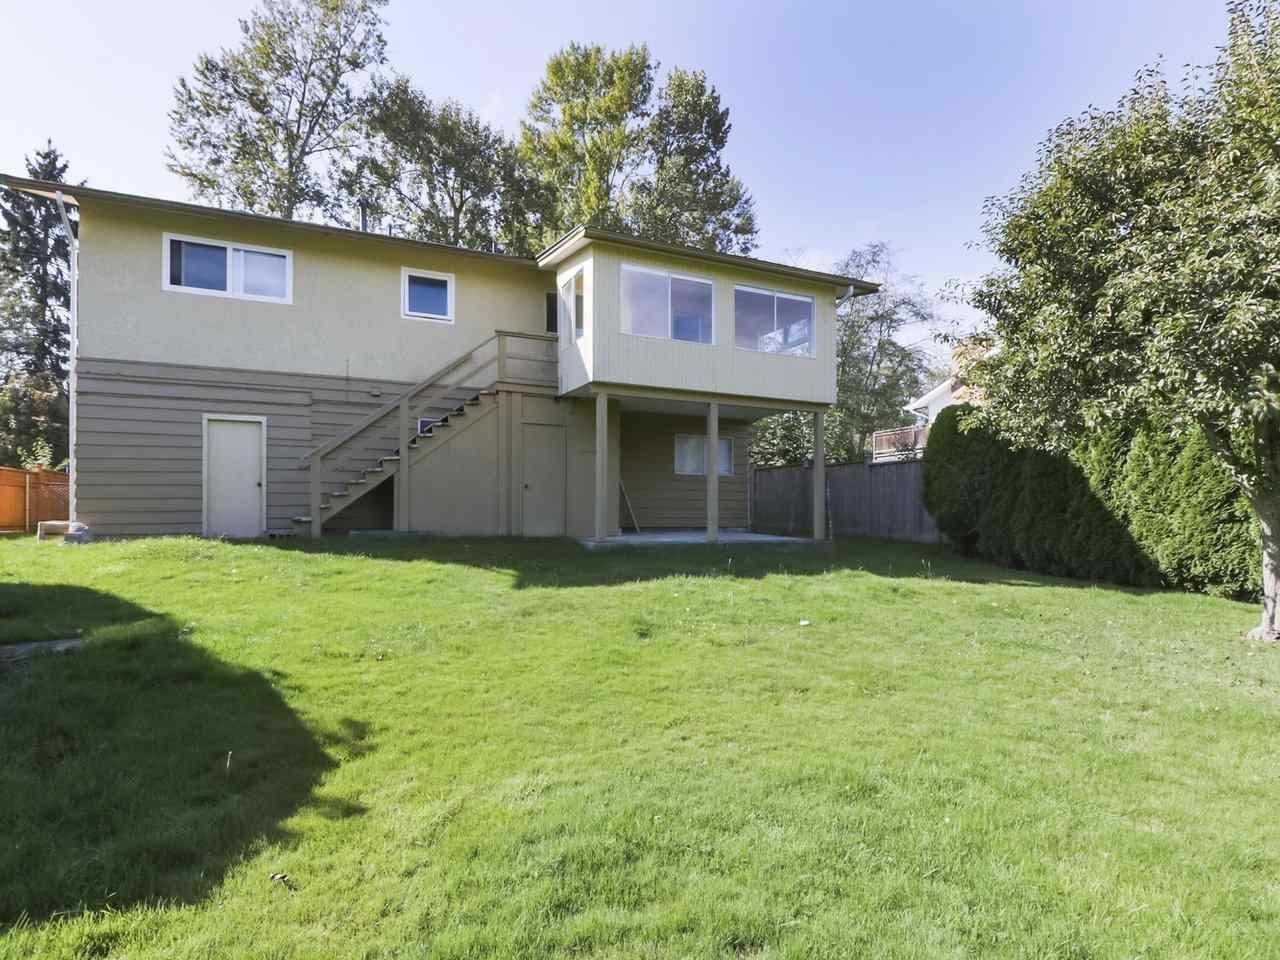 Photo 20: Photos: 1426 KENT Street: White Rock House for sale (South Surrey White Rock)  : MLS®# R2406738